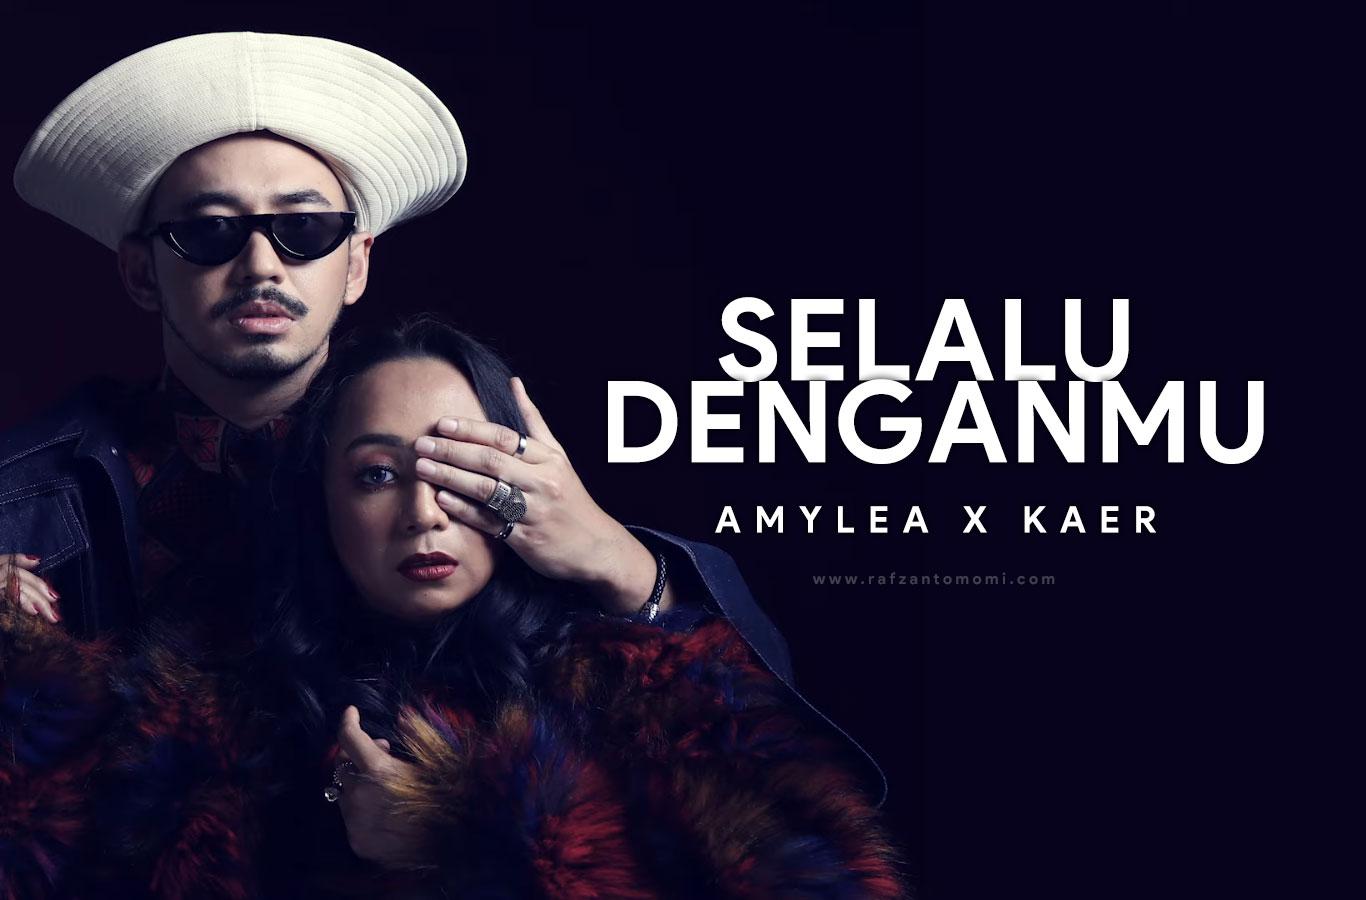 Lirik Lagu Amylea x Kaer - Selalu Denganmu (OST Drama Akasia Adellea Sofea)